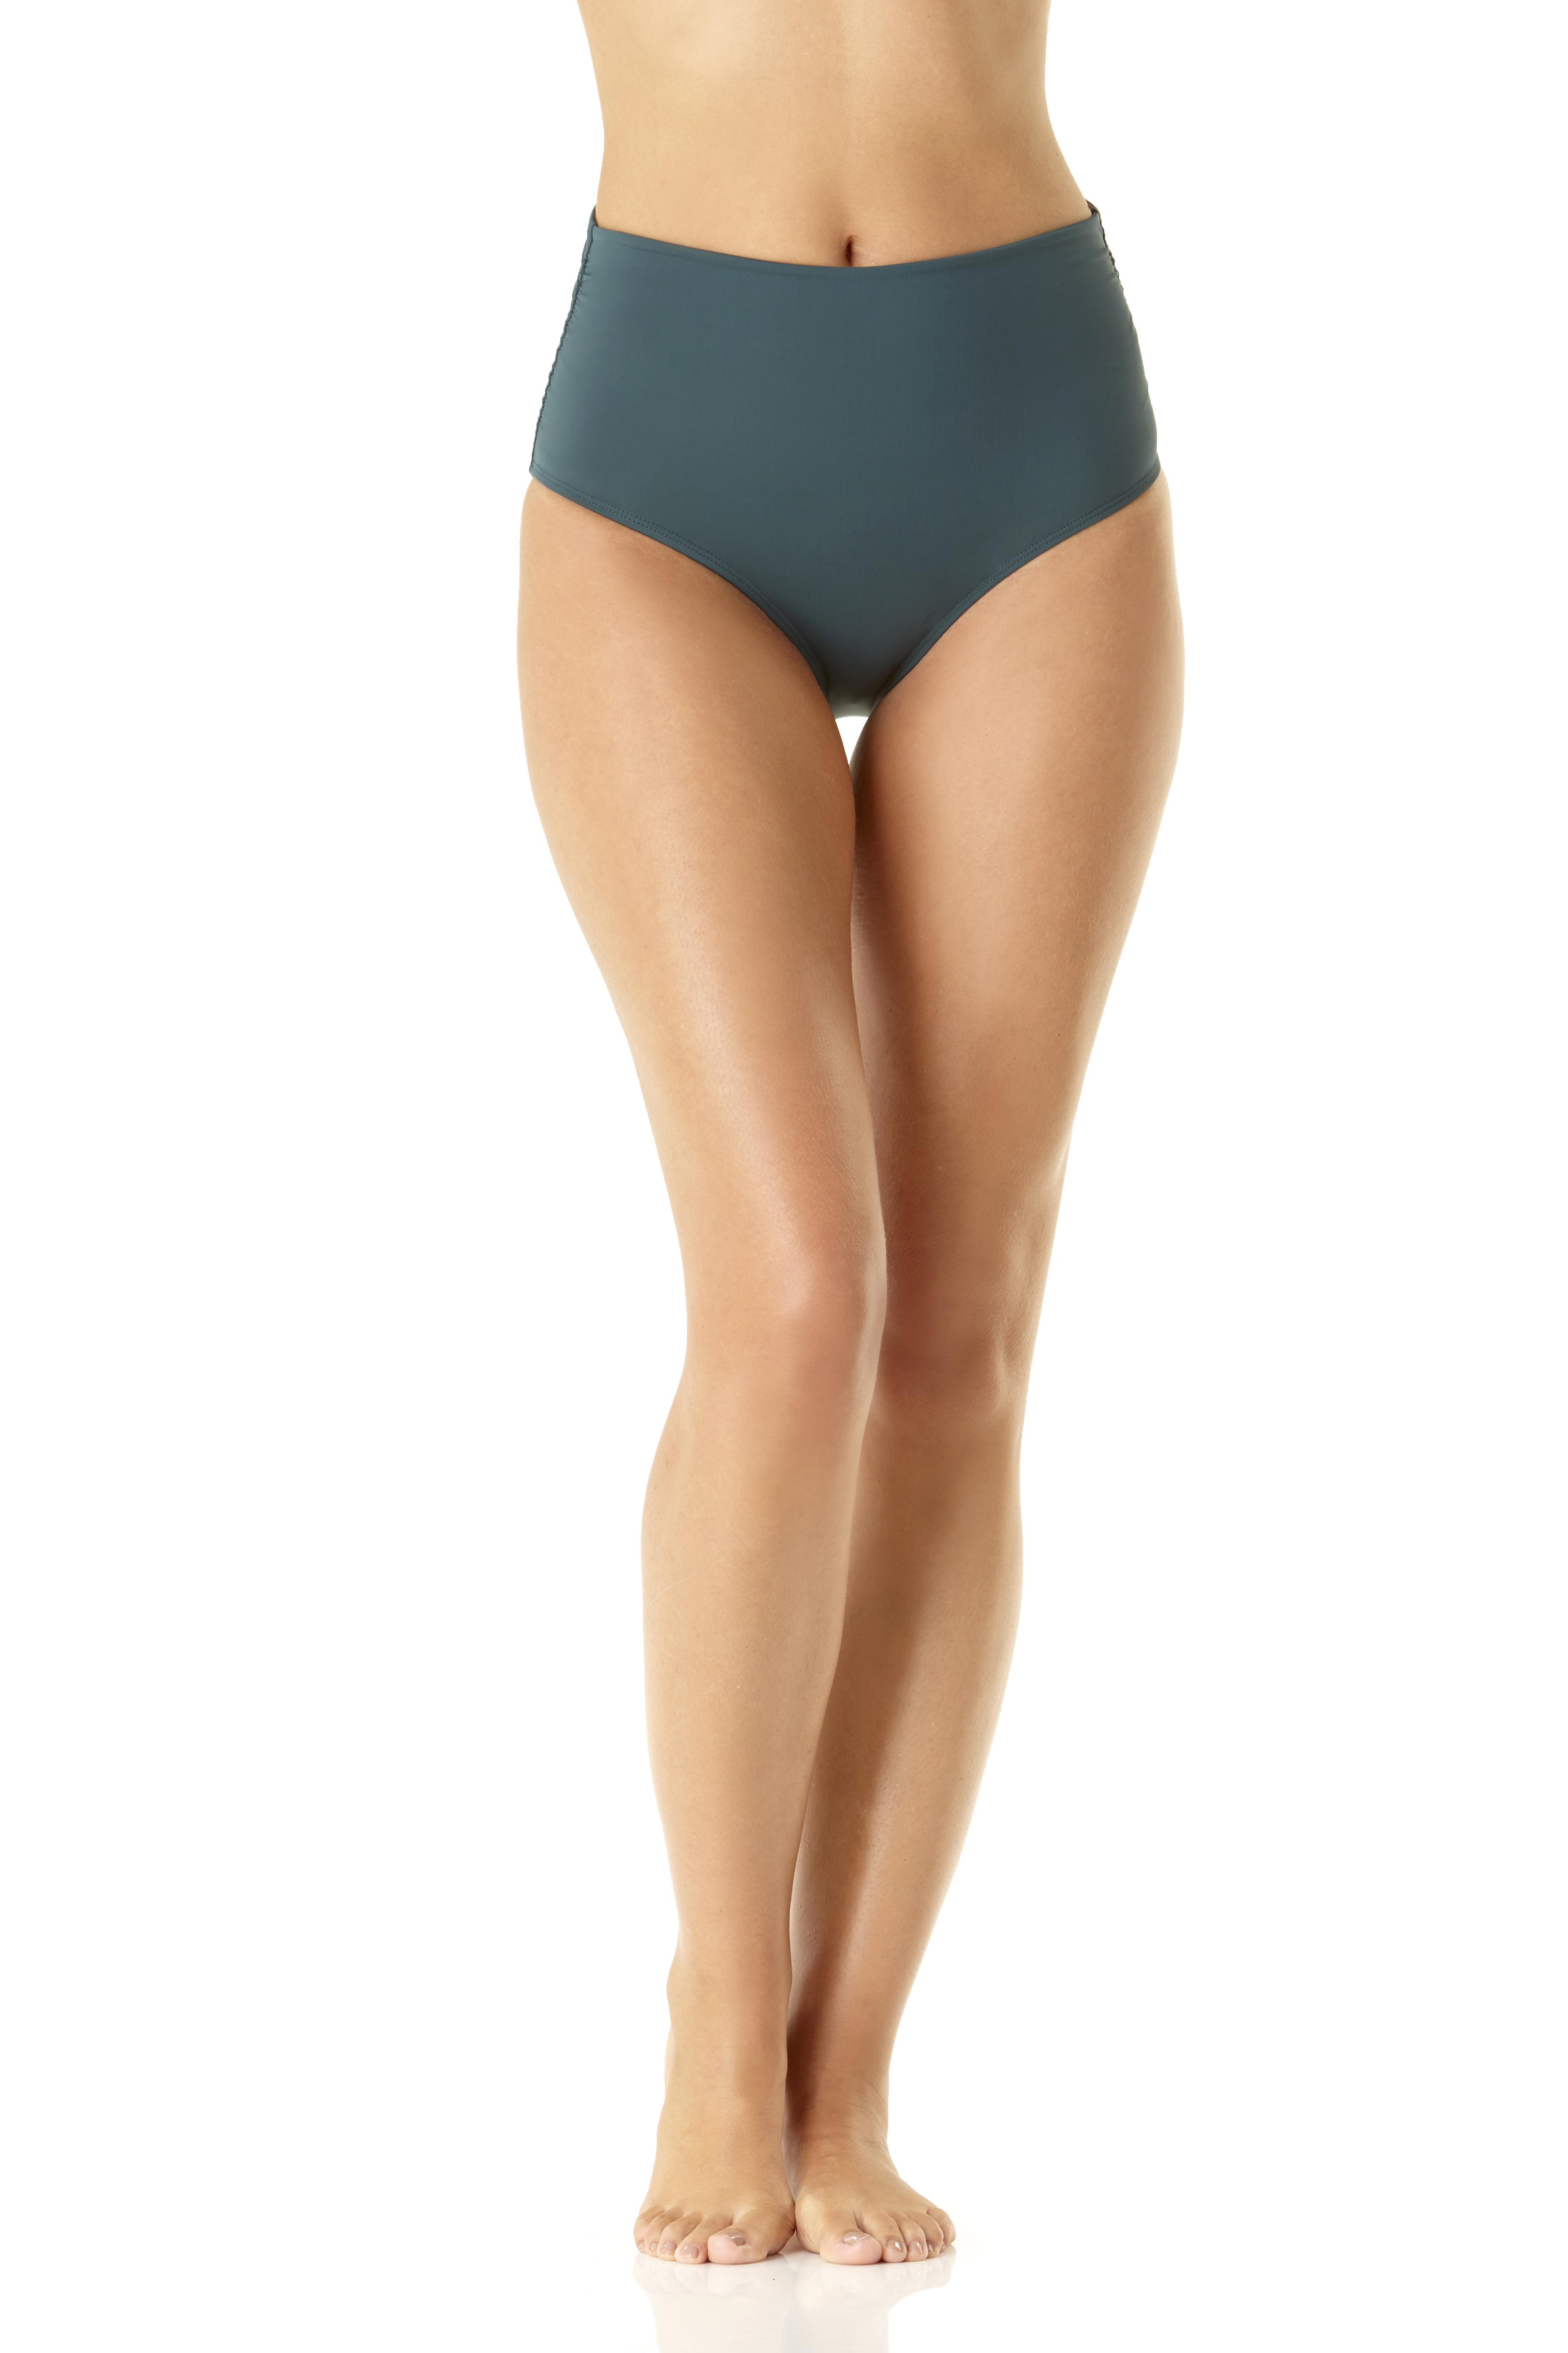 Anne Cole® Live in Color Hi Waist Shirred Bikini Swimsuit Bottom - Eucalyptus Green - Front